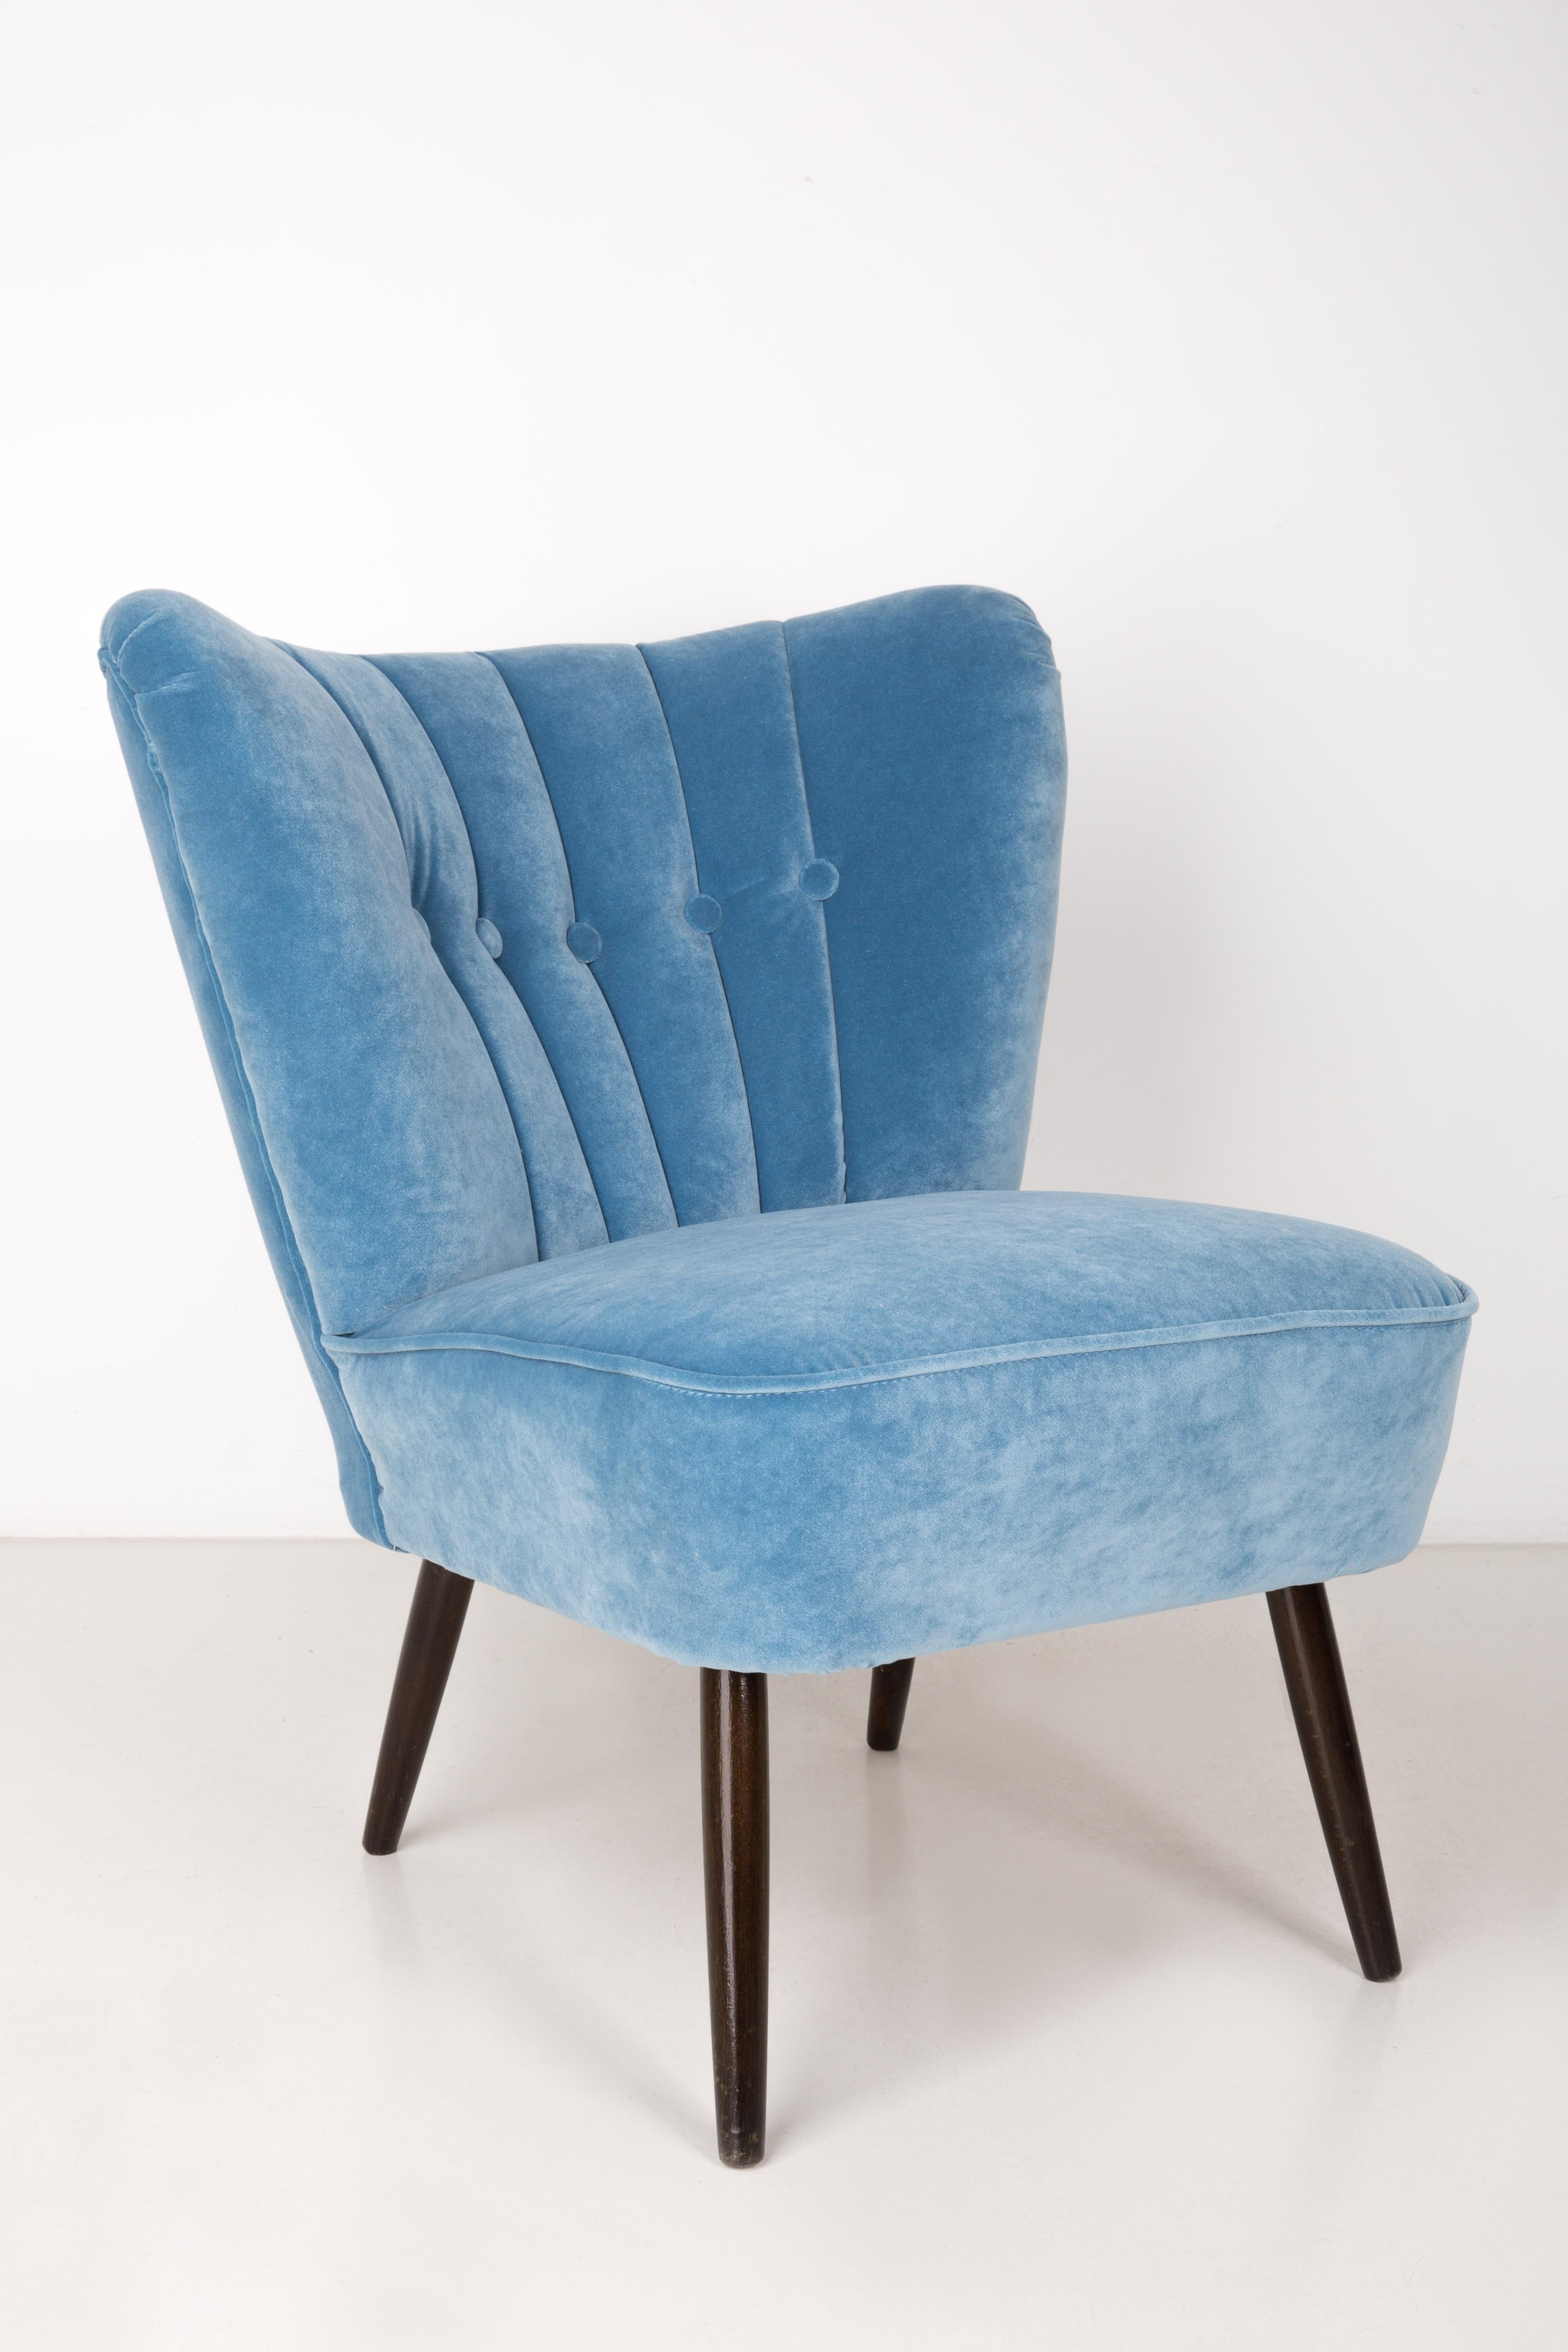 Midcentury Baby Blue Velvet Armchair, Germany, 1960s